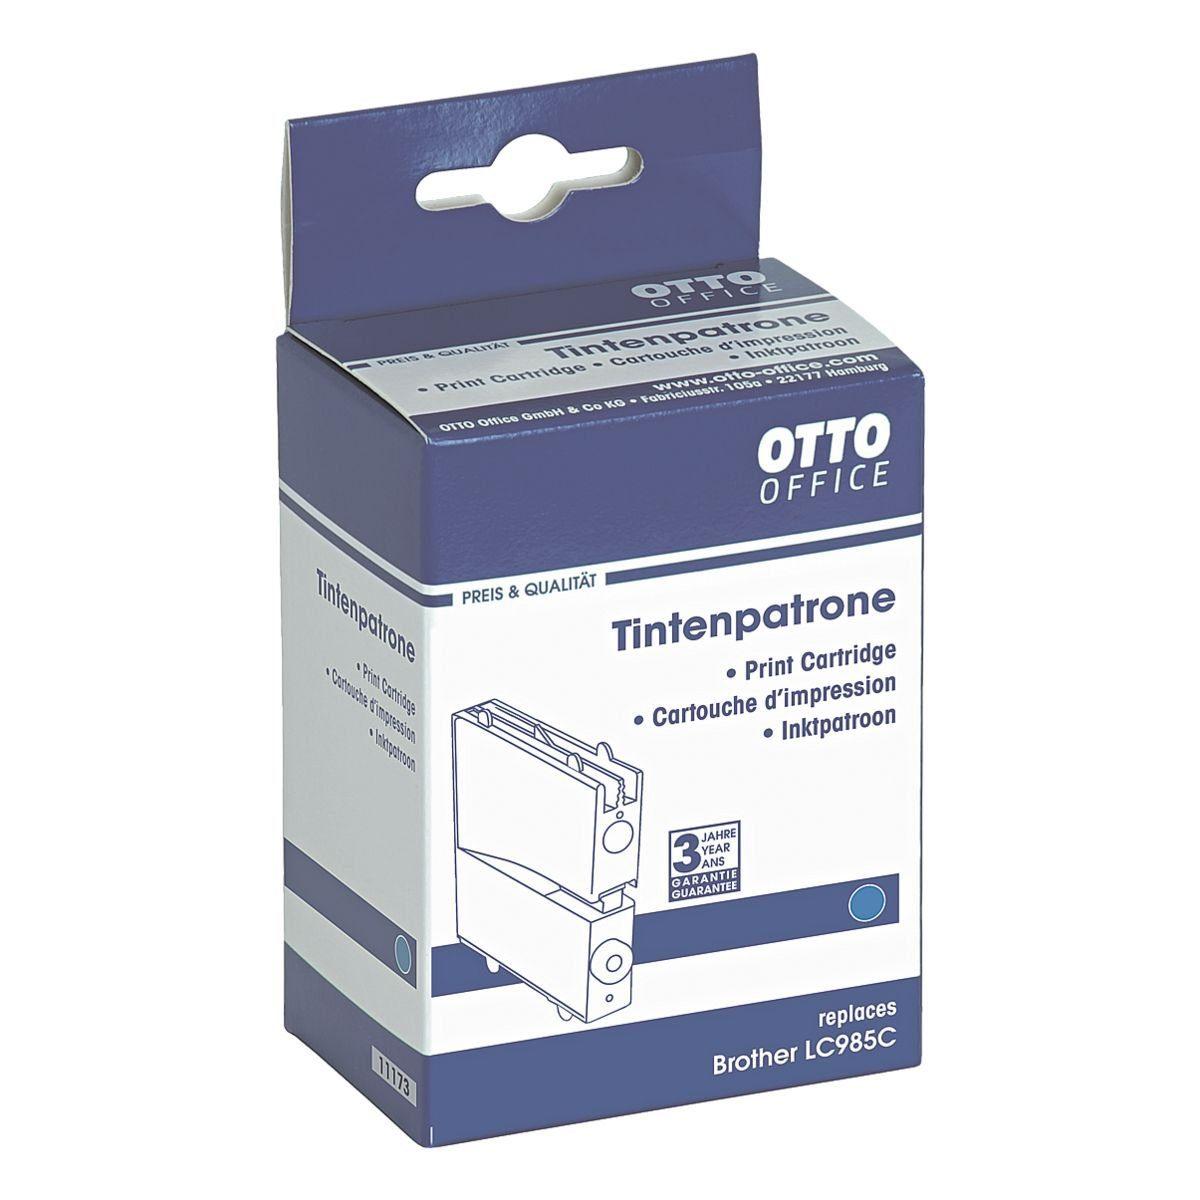 OTTO Office Standard Tintenpatrone ersetzt Brother »LC985C«